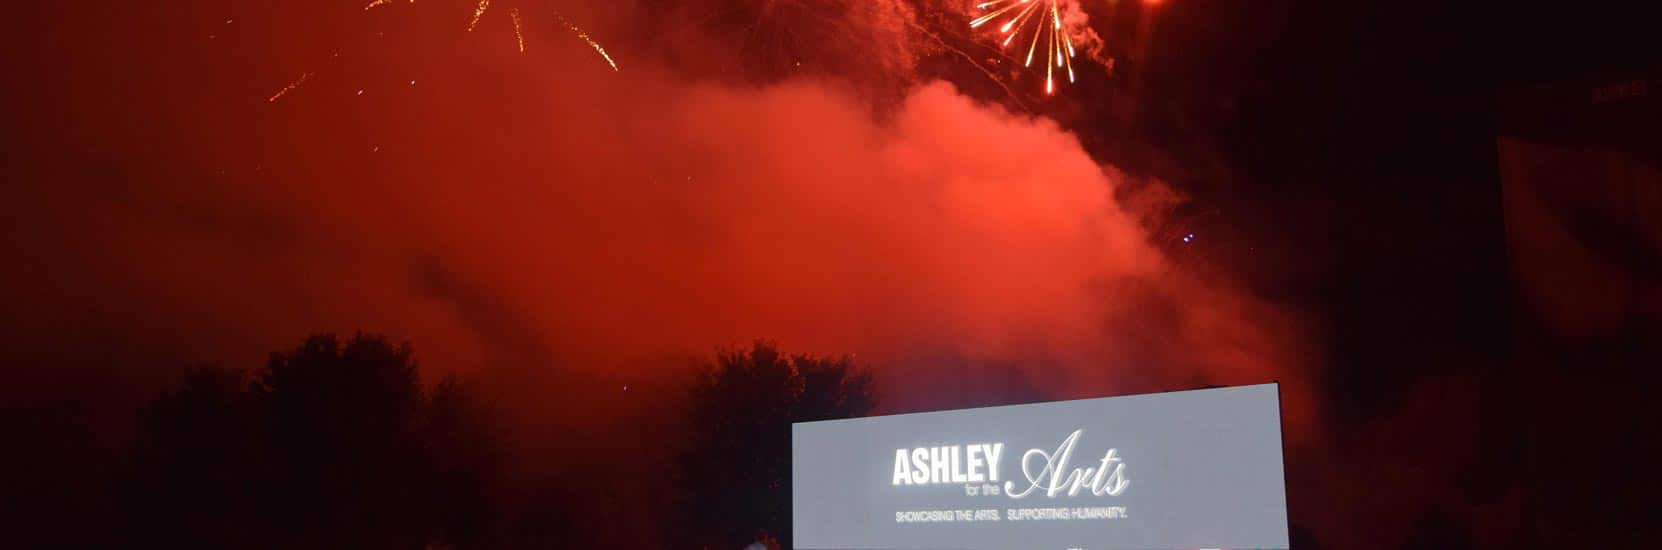 Ashley for the Arts – Arcadia, WI - Insane Impact